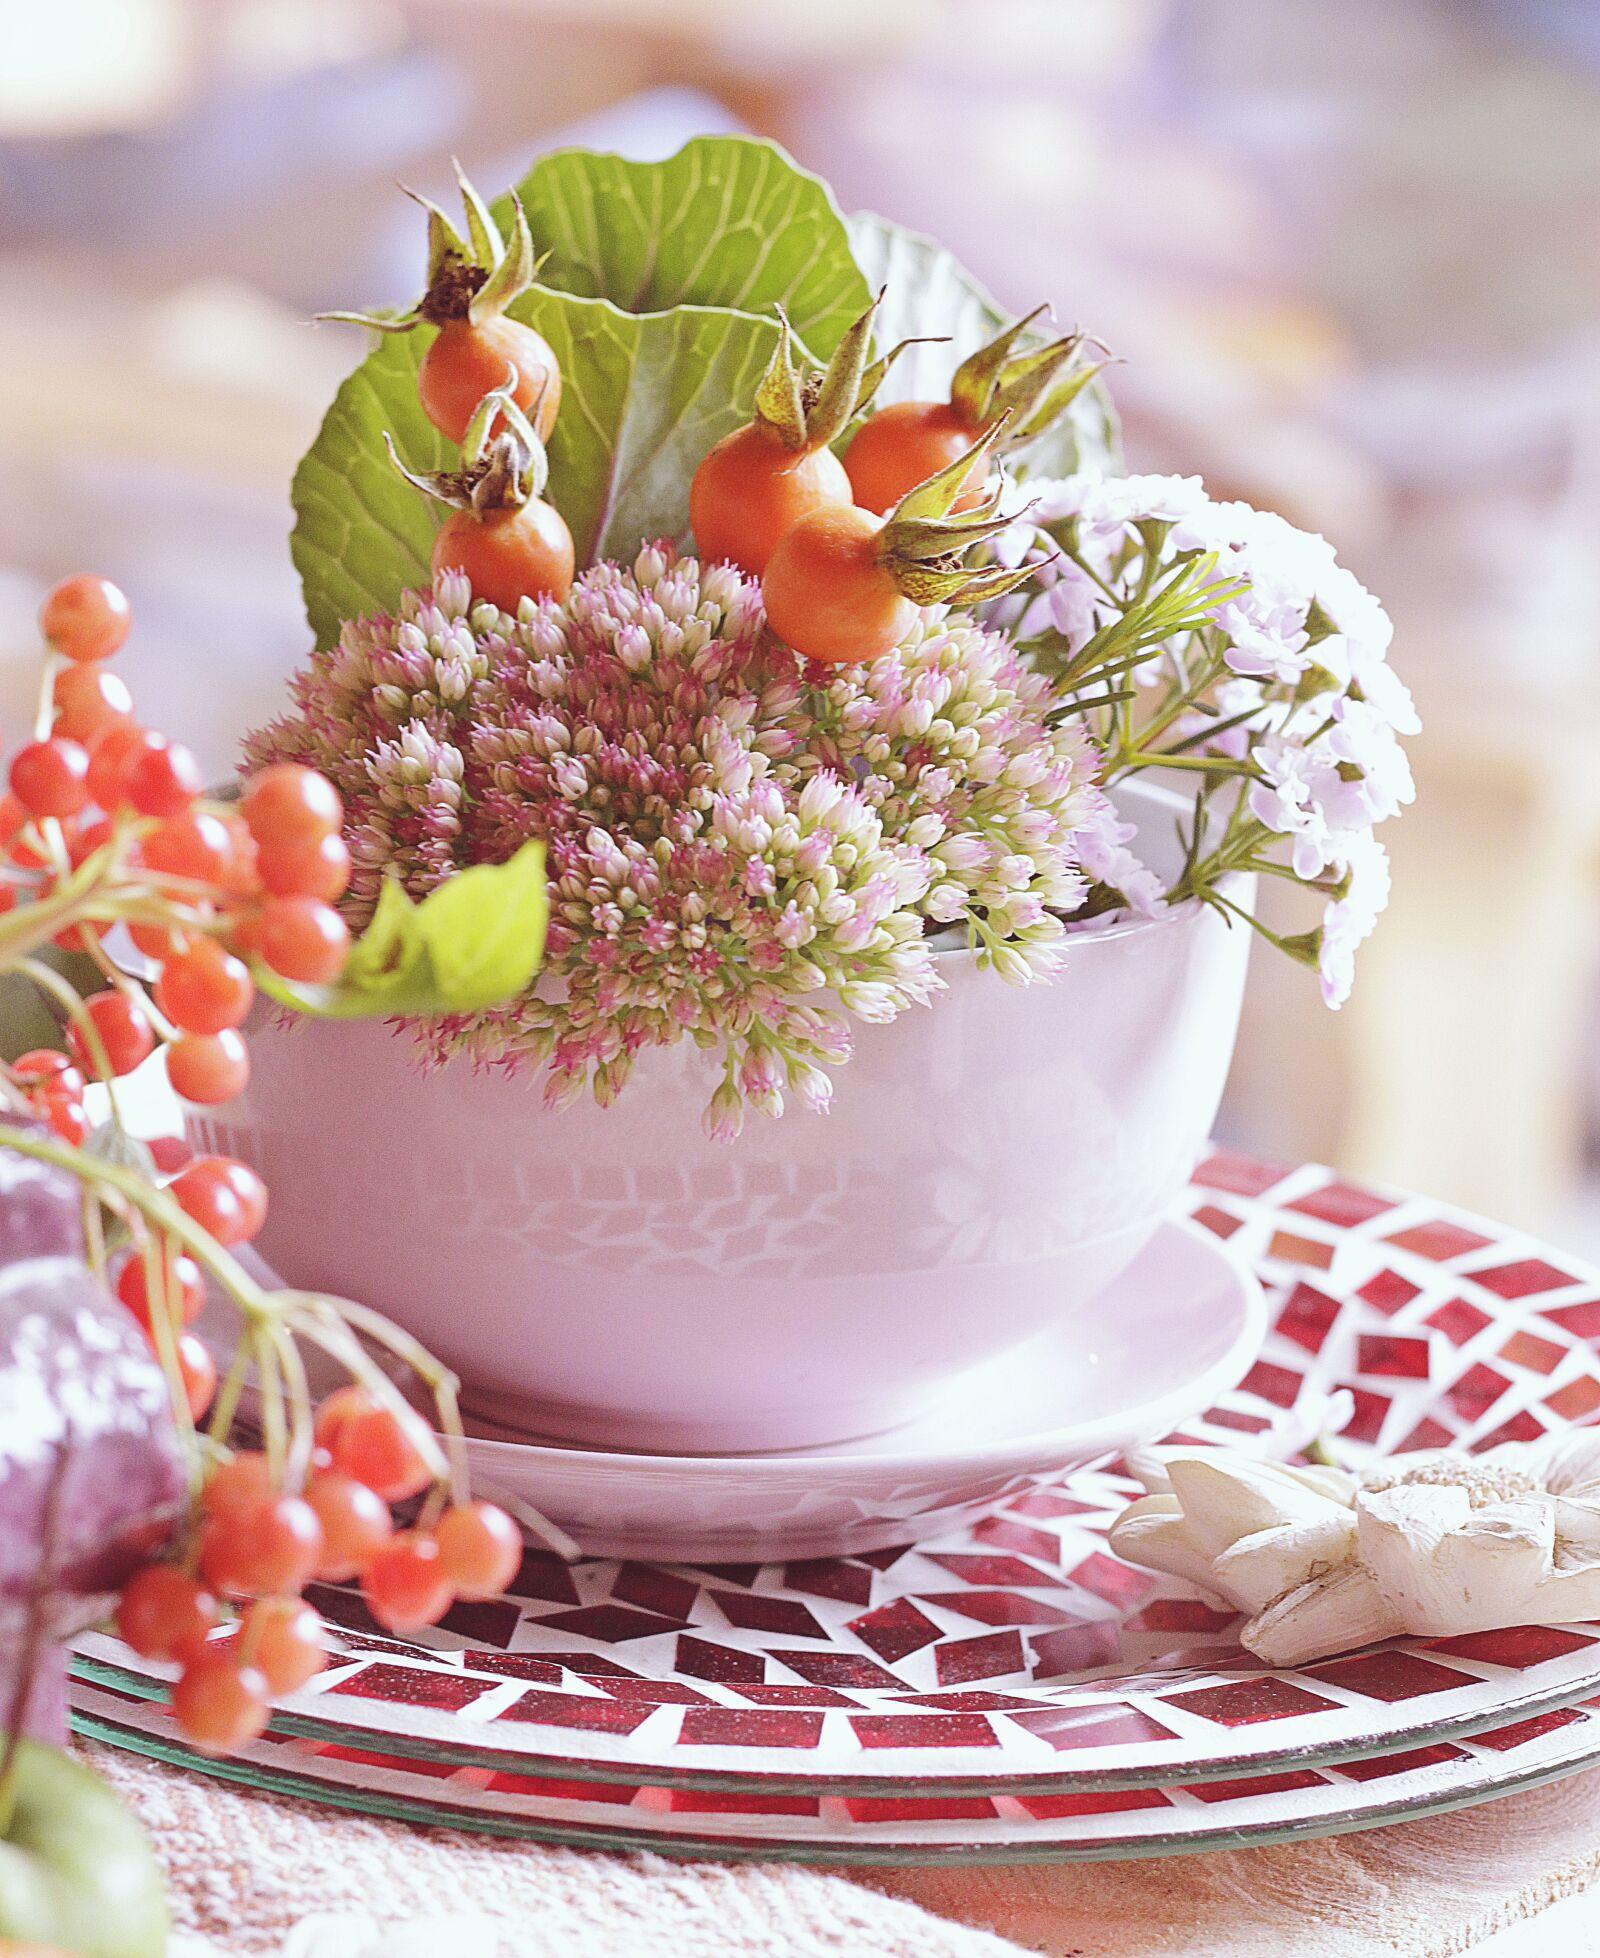 "Canon EOS 100D (EOS Rebel SL1 / EOS Kiss X7) sample photo. ""Autumn, table decorations, mood"" photography"